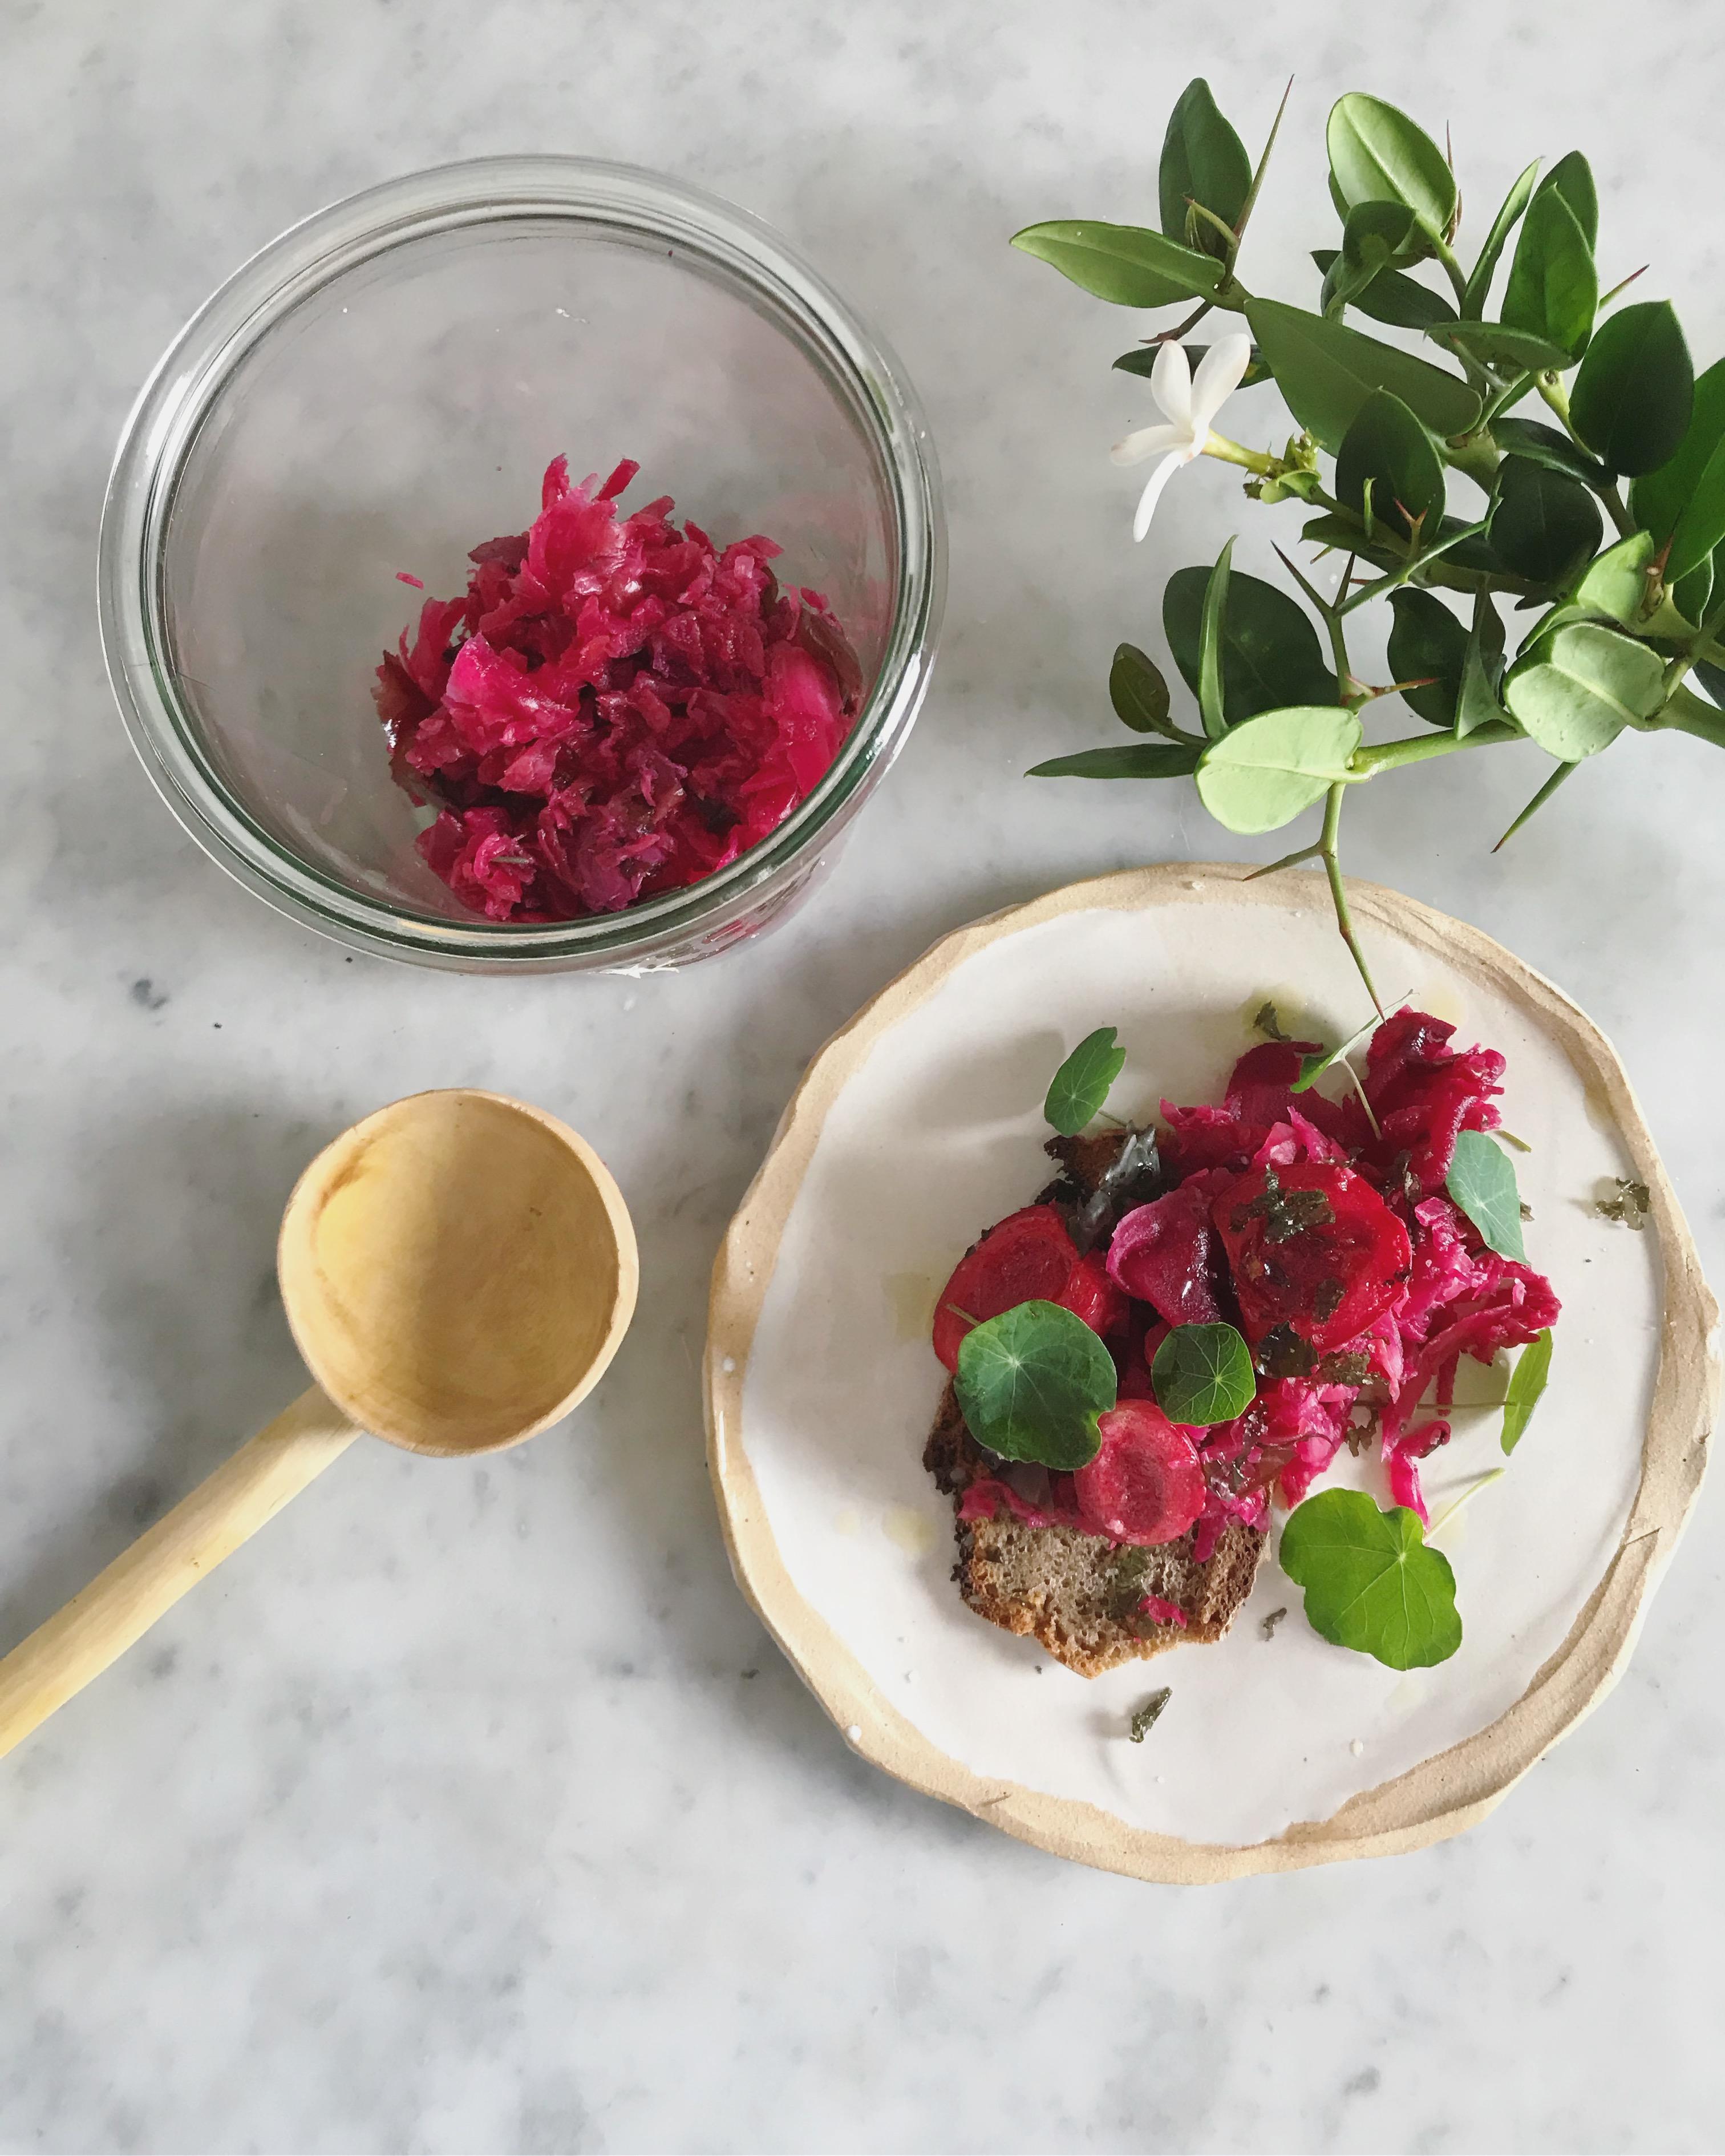 recipe-carissa-berry-kraut-natal-plum-south-african-wild-rosemary-dill-seeds-filippa-harrington